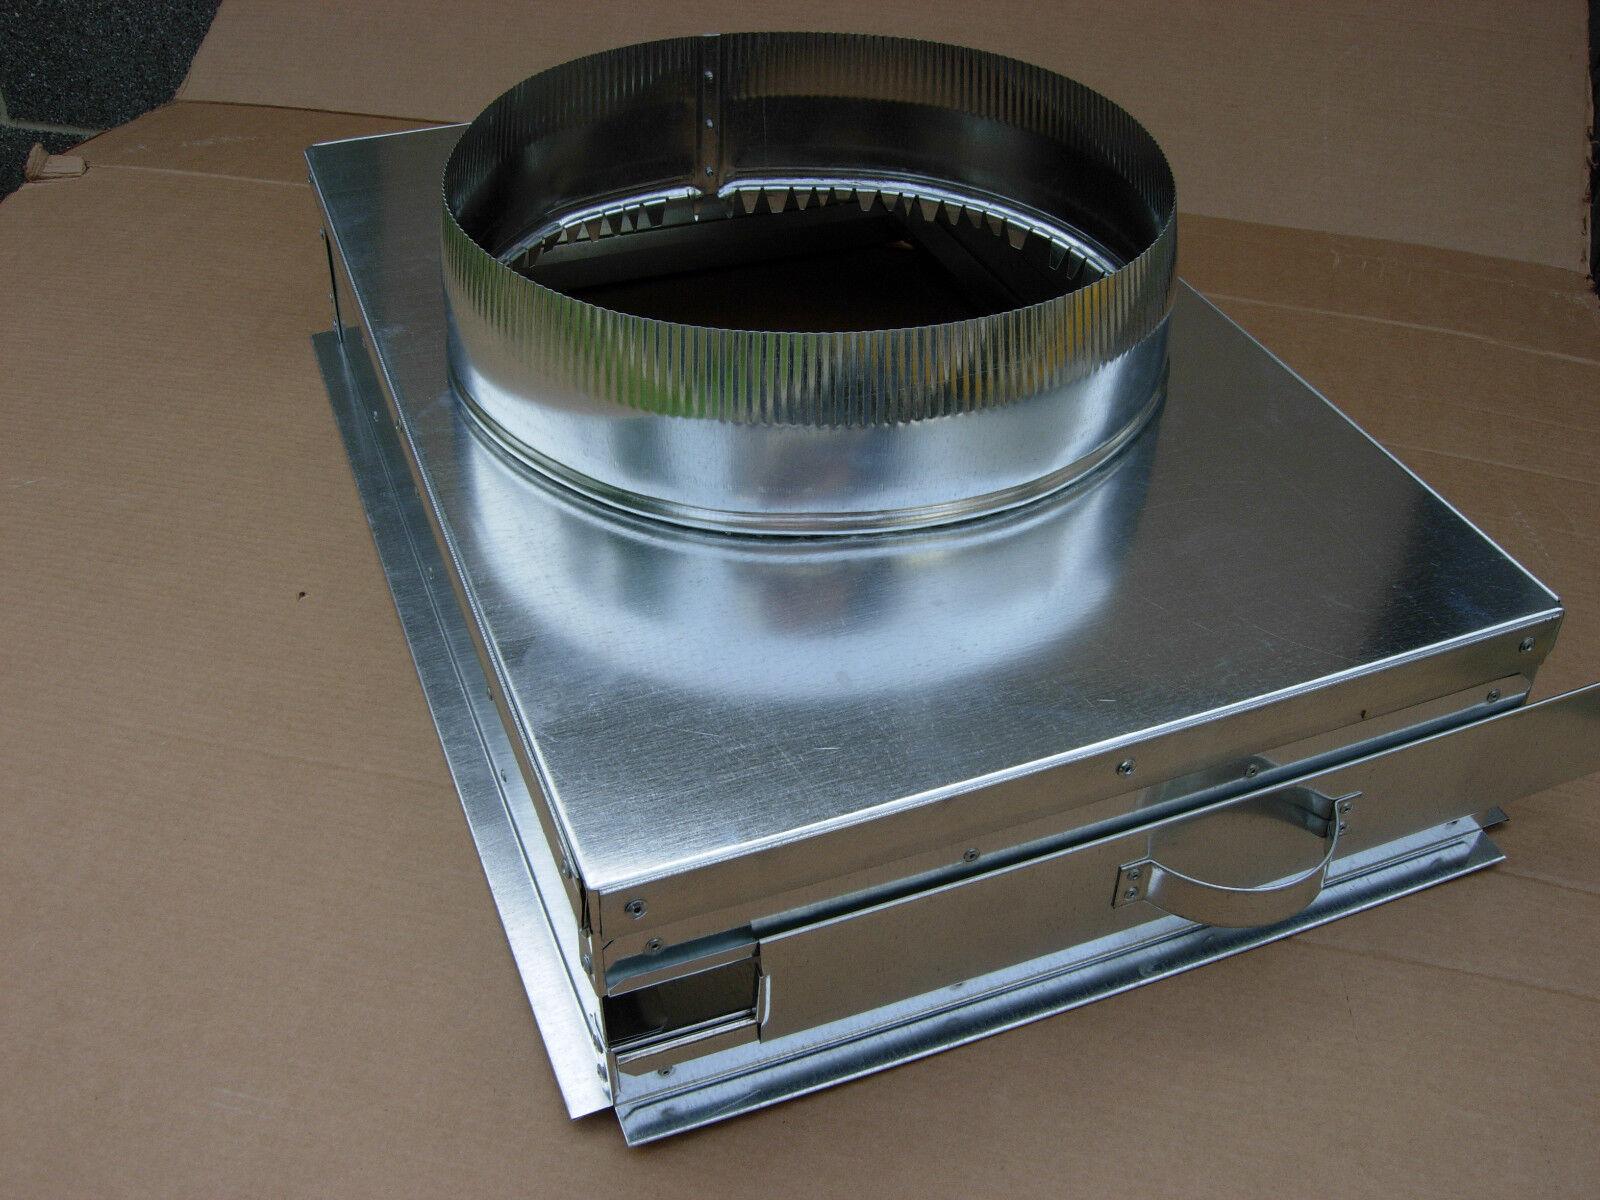 "Fresh Air Intake Filter box HVAC system Duct Air Filter collars 10"" Home  HVAC Air Filters Home Improvement Home & Garden"